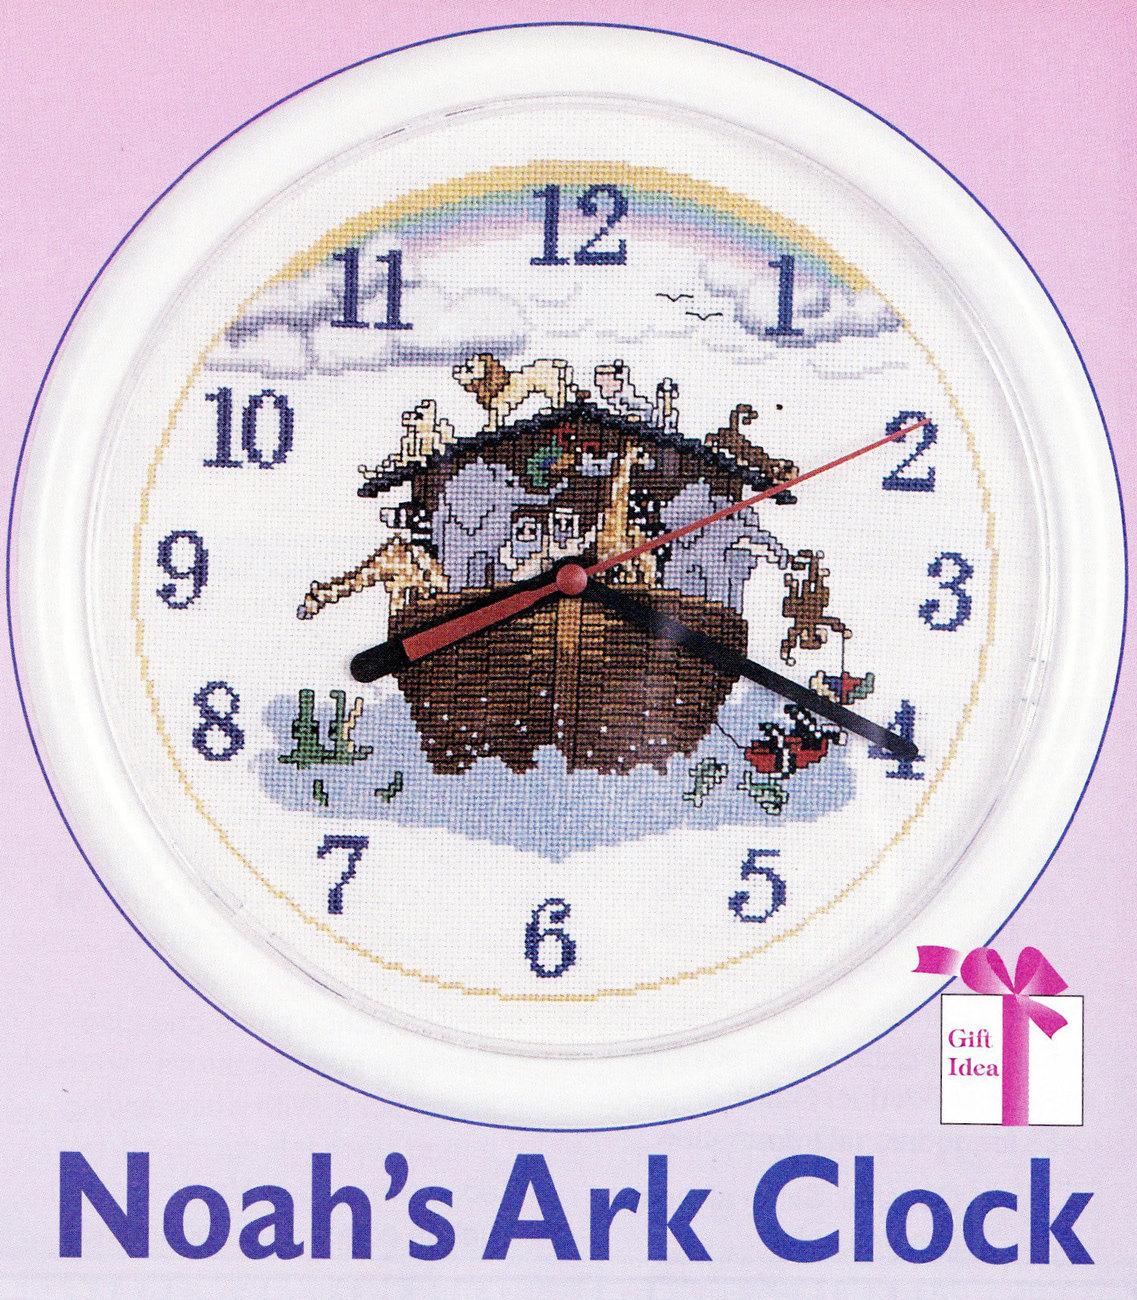 THE CROSS STITCHER VOL.1, NO.2 CAT MONTAGE NOAH'S ARK CLOCK QUILT AFGHAN SANTA